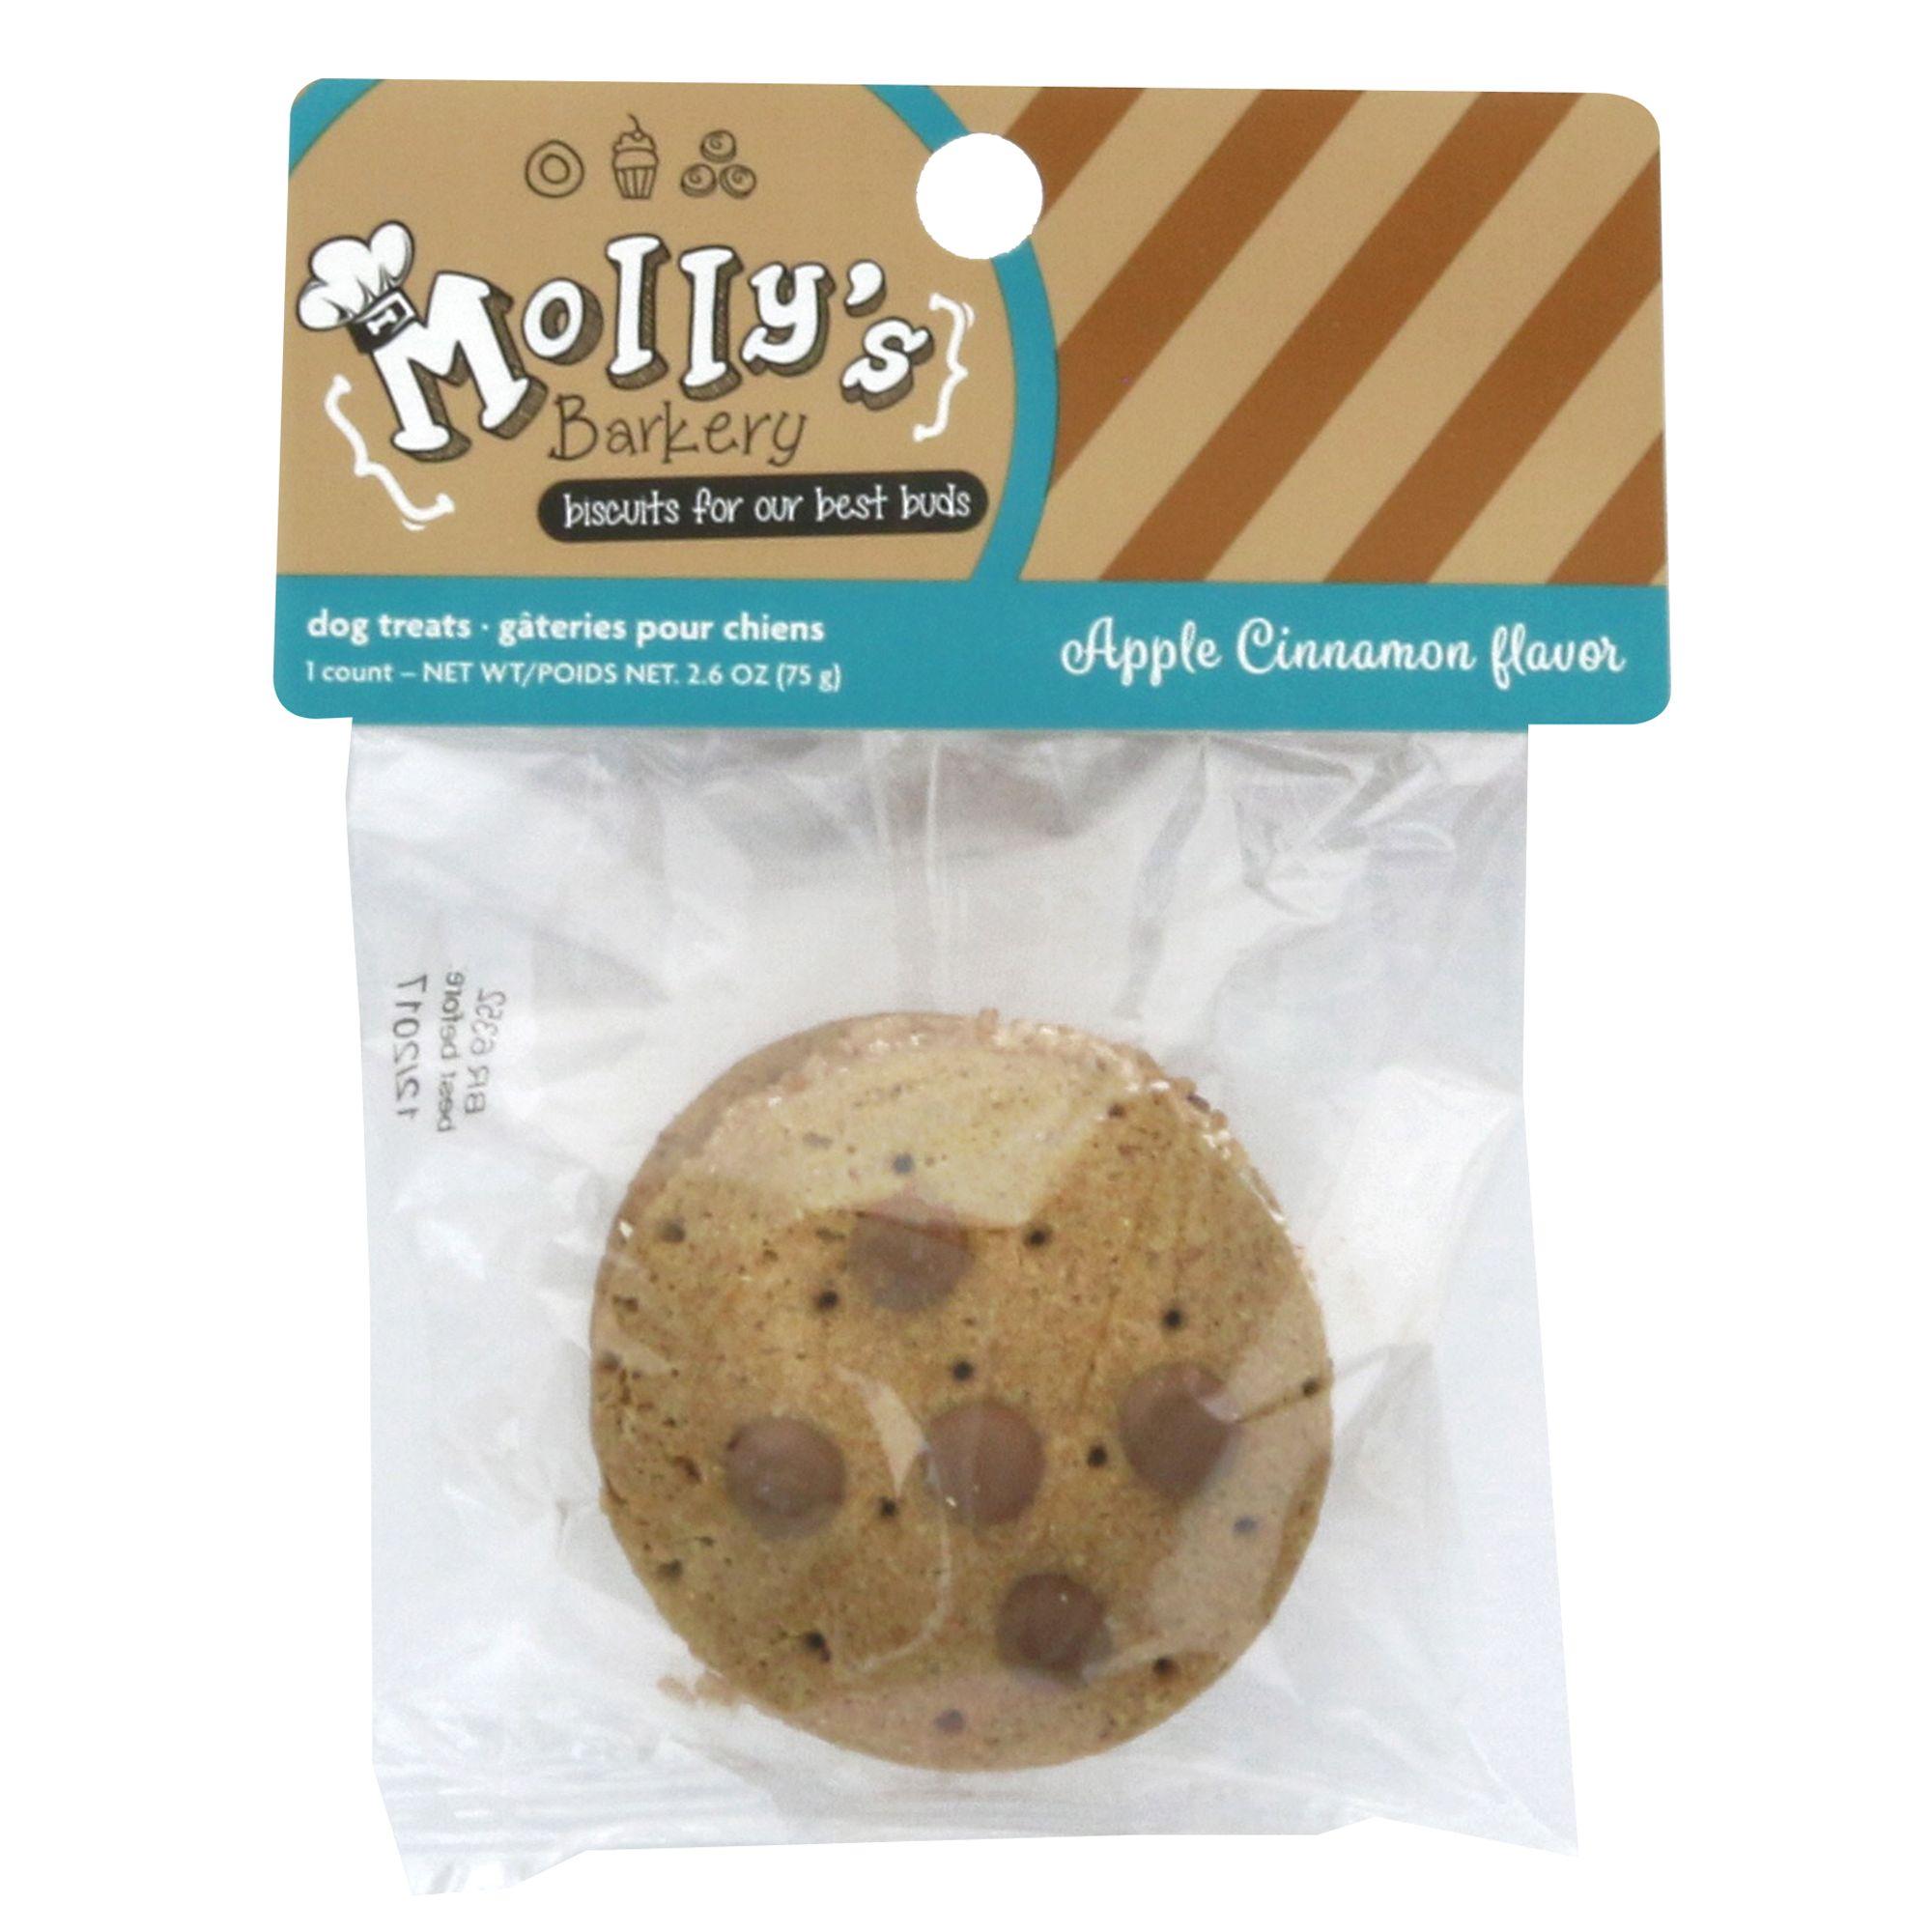 Mollys Barkery Cookie Sandwich Dog Treat Apple Cinnamon